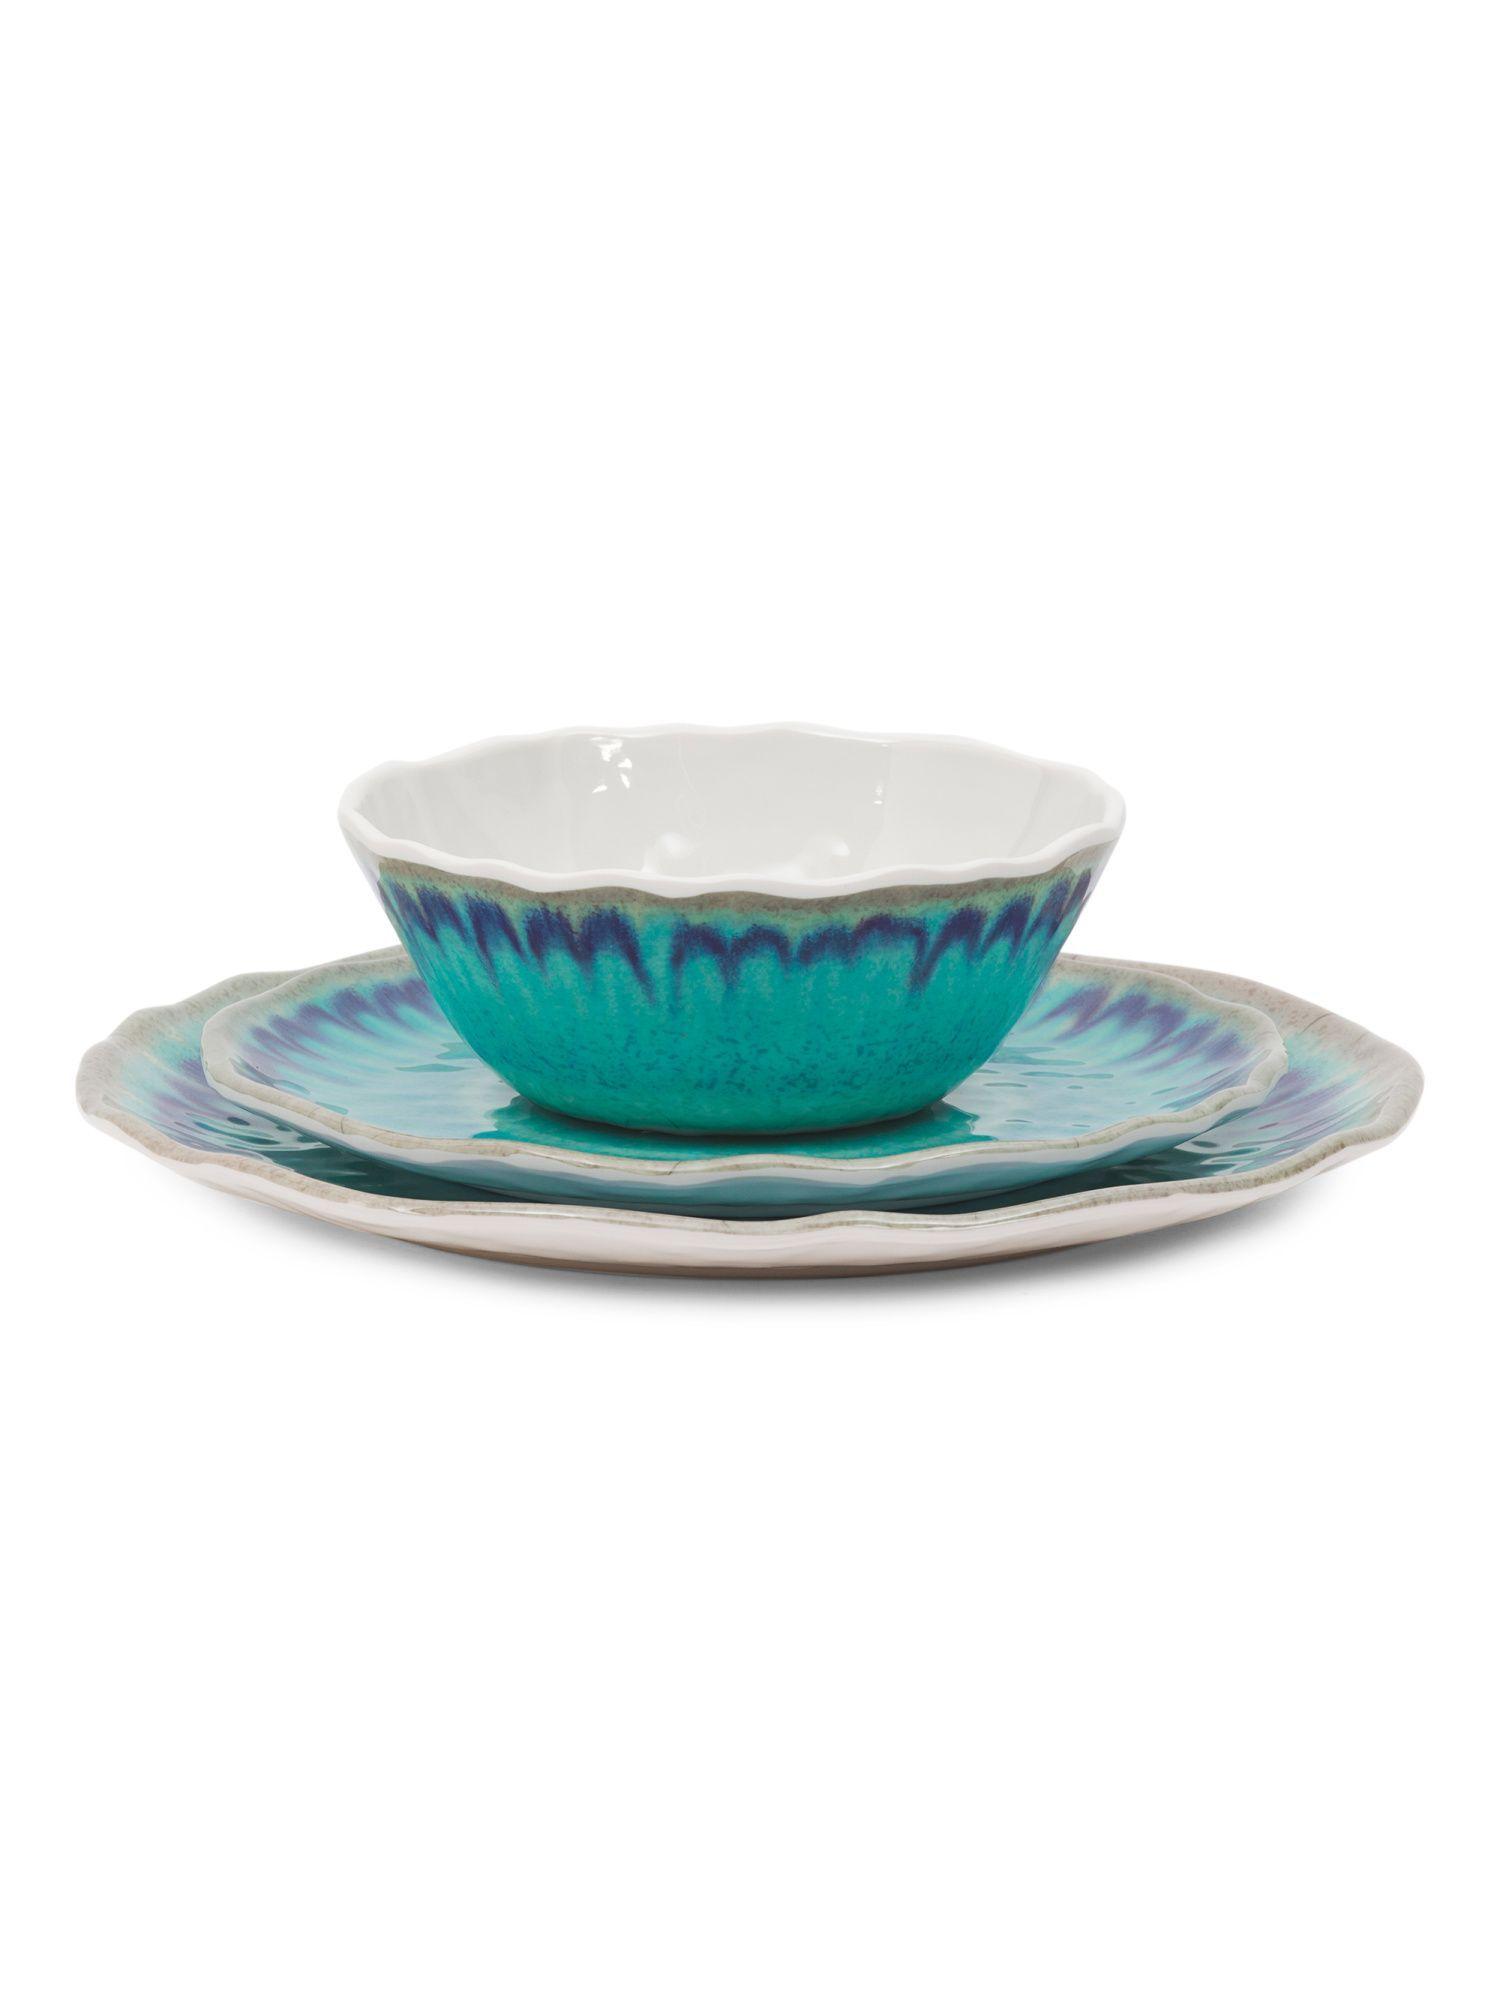 12pc Sea Splash Outdoor Dinnerware Set | Products | Pinterest ...